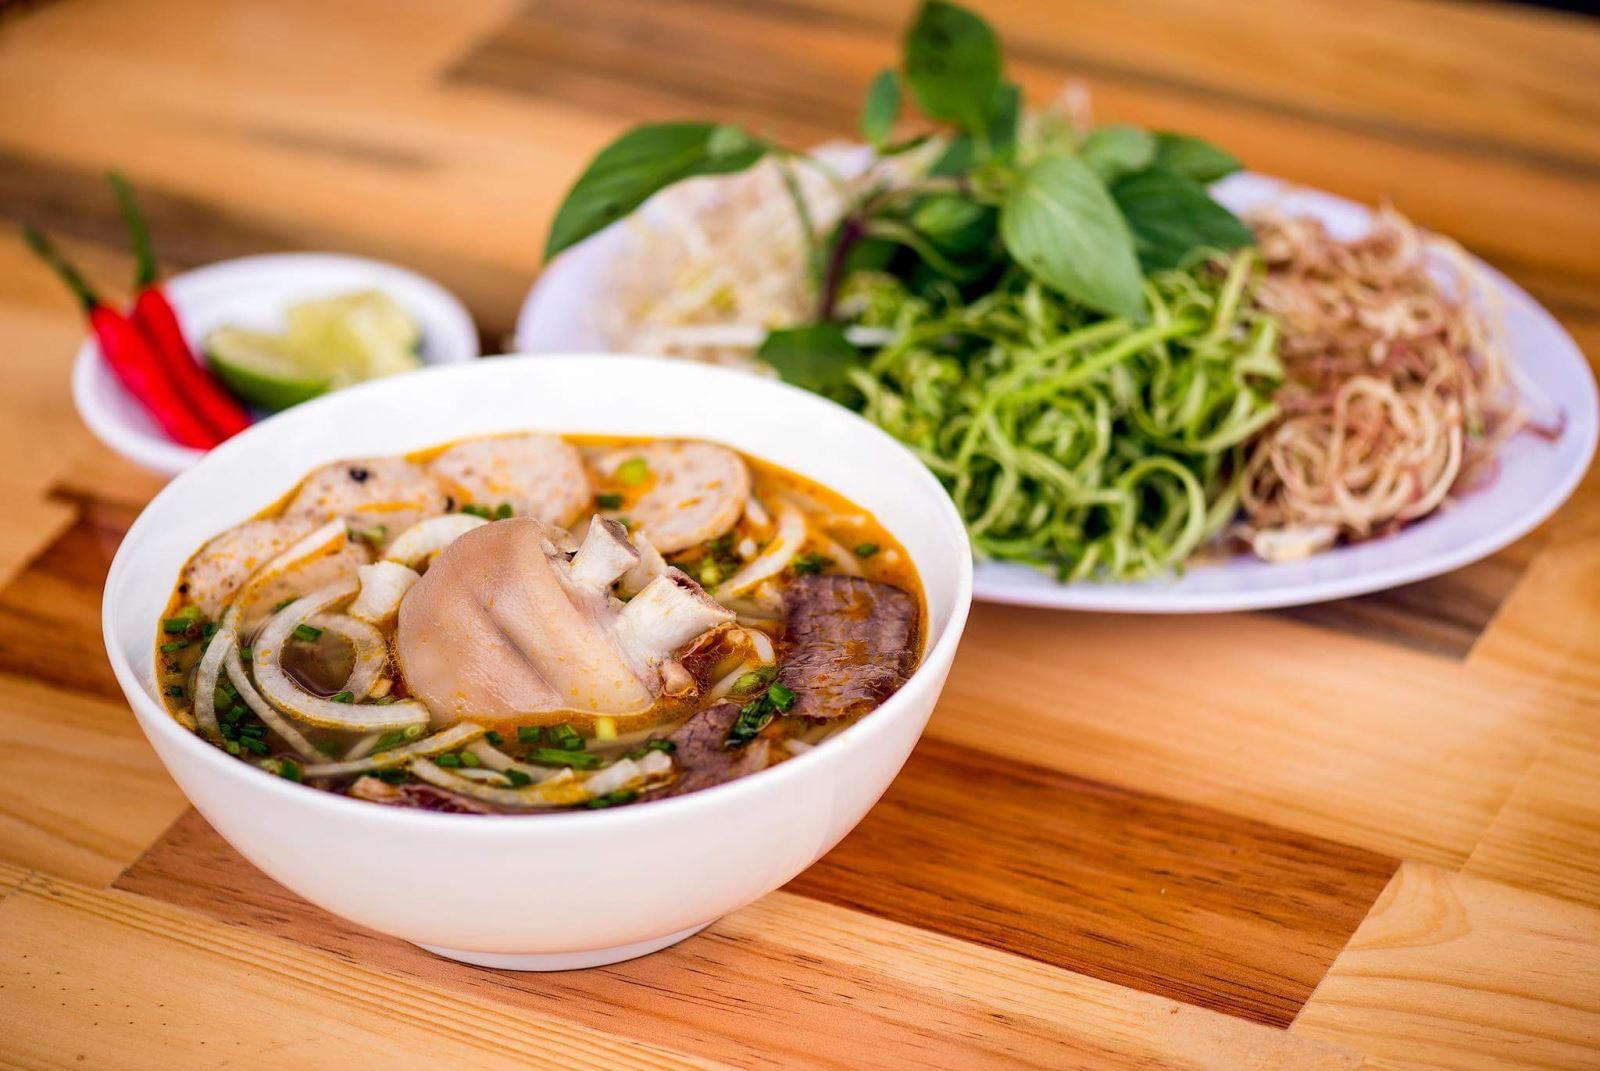 Bun-bo-hue-Recipe–Vietnamese-spicy-Vietnamese-beef-noodle-soup 1